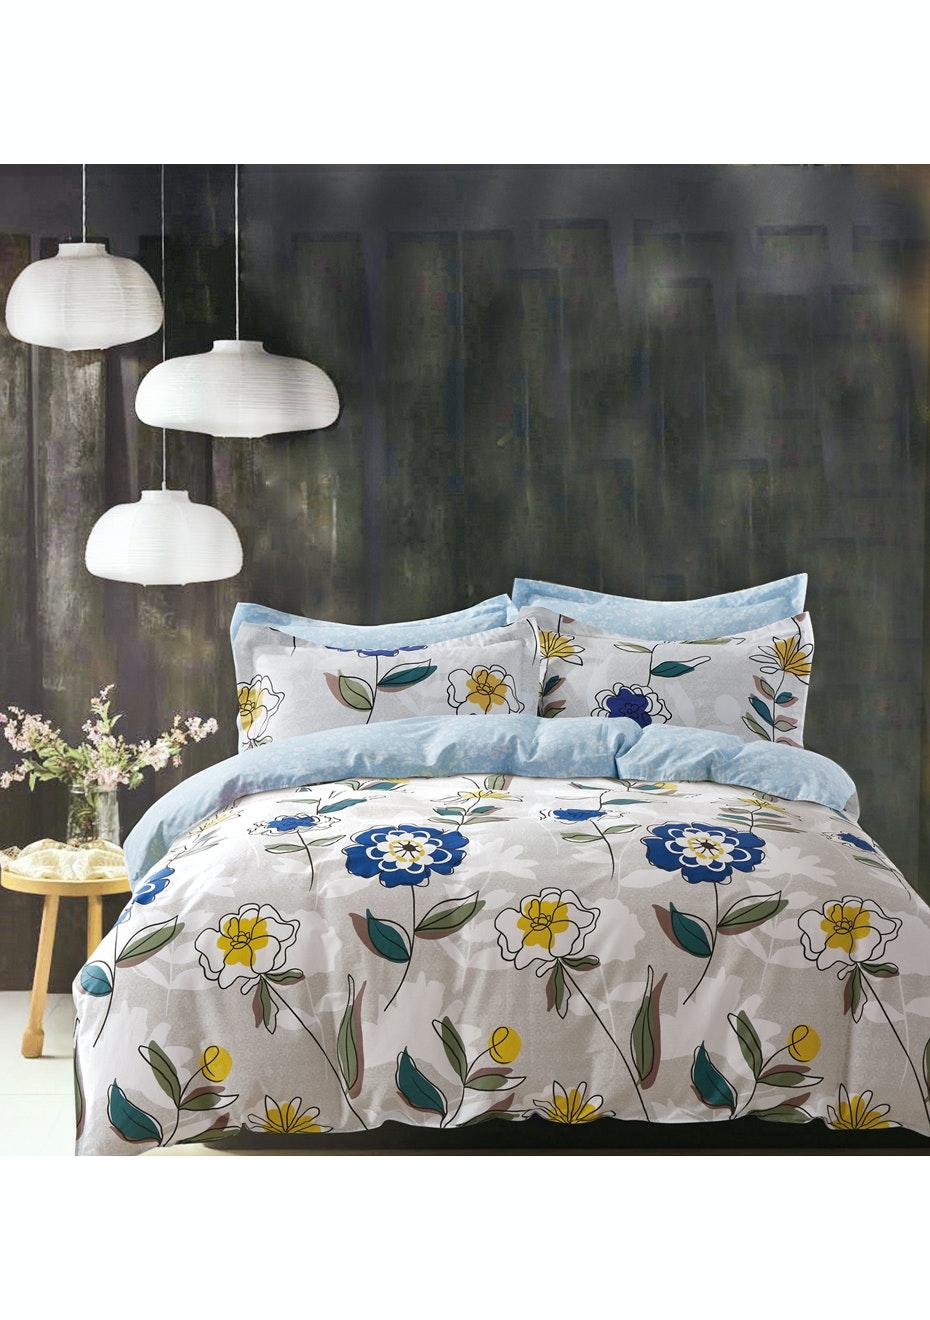 Jillian Quilt Cover Set - Reversible Design - 100% Cotton Queen Bed